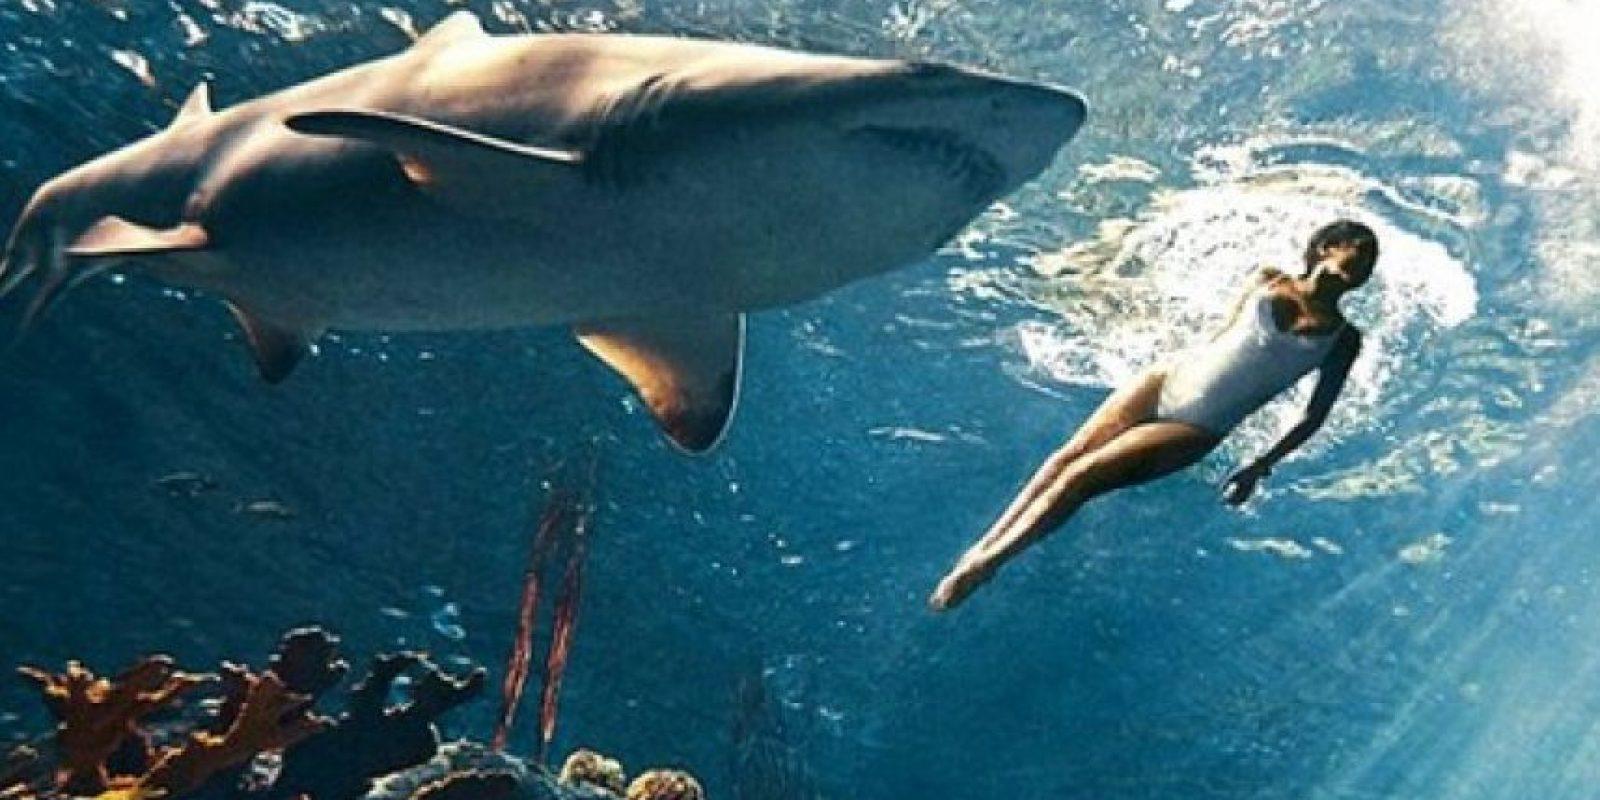 Rihanna se animó a nadar en una piscina llena de tiburones Foto:Harper's Bazaar